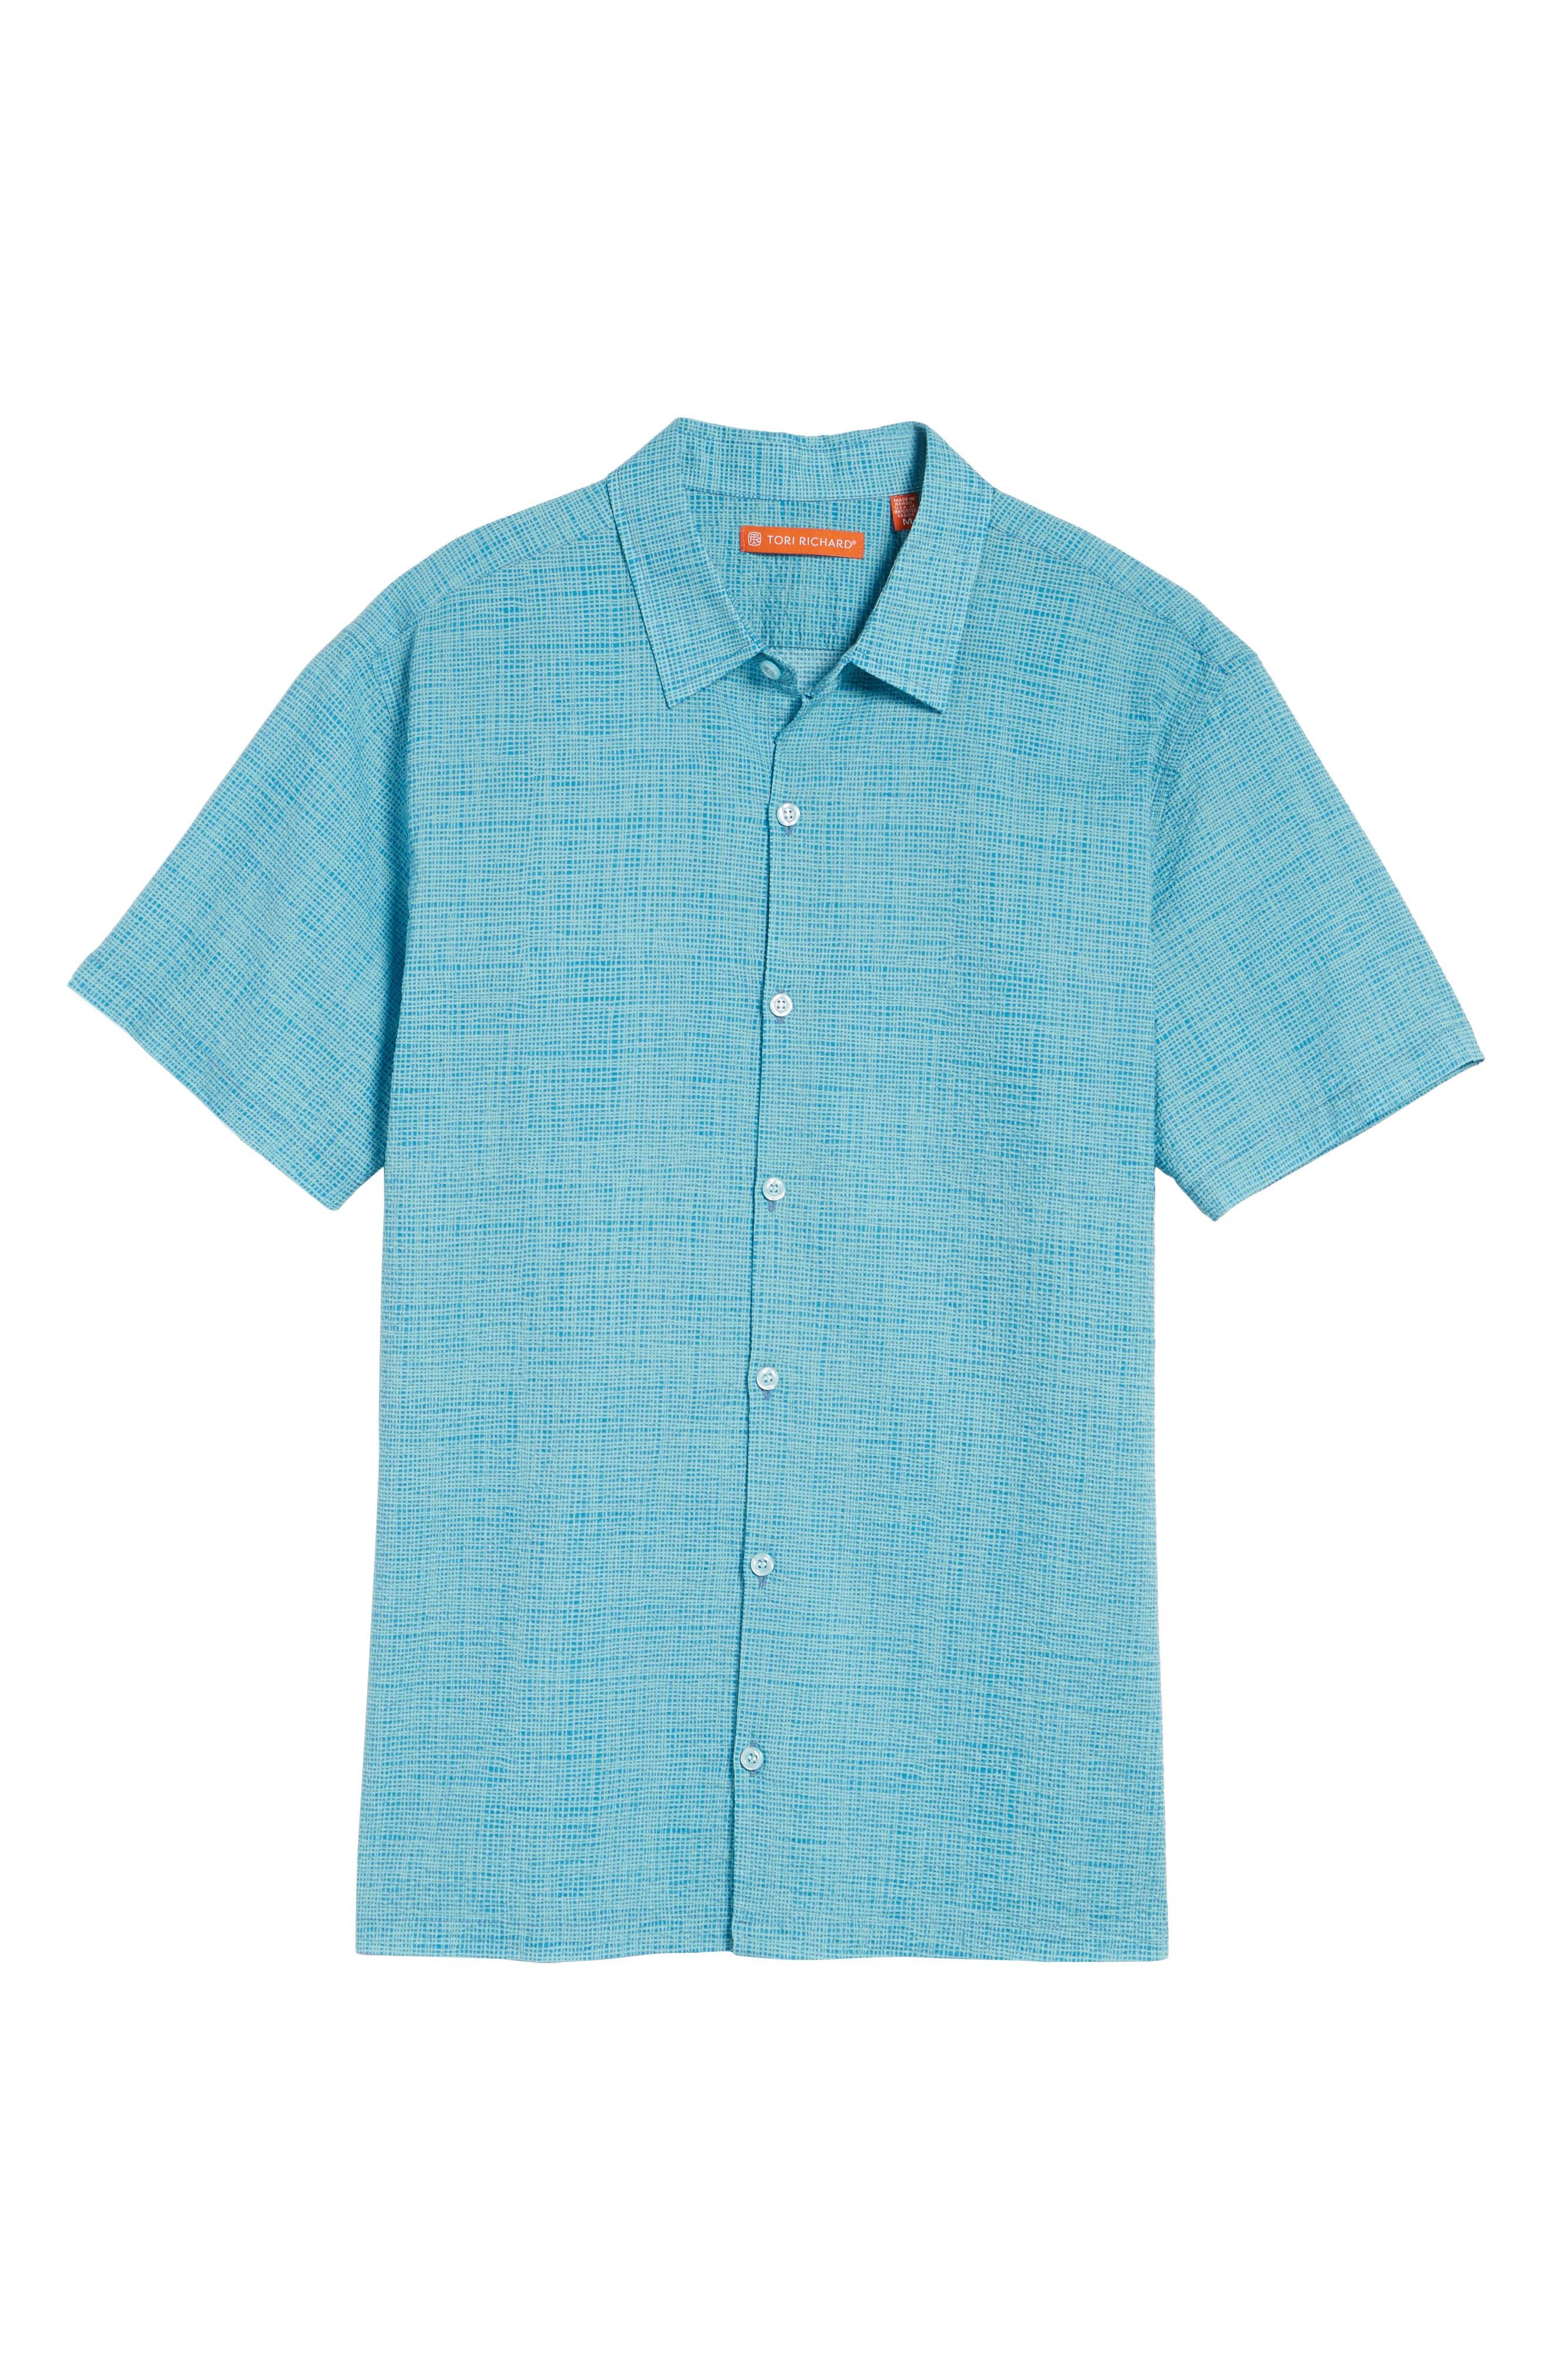 Net Worth Slim Fit Camp Shirt,                             Alternate thumbnail 6, color,                             400